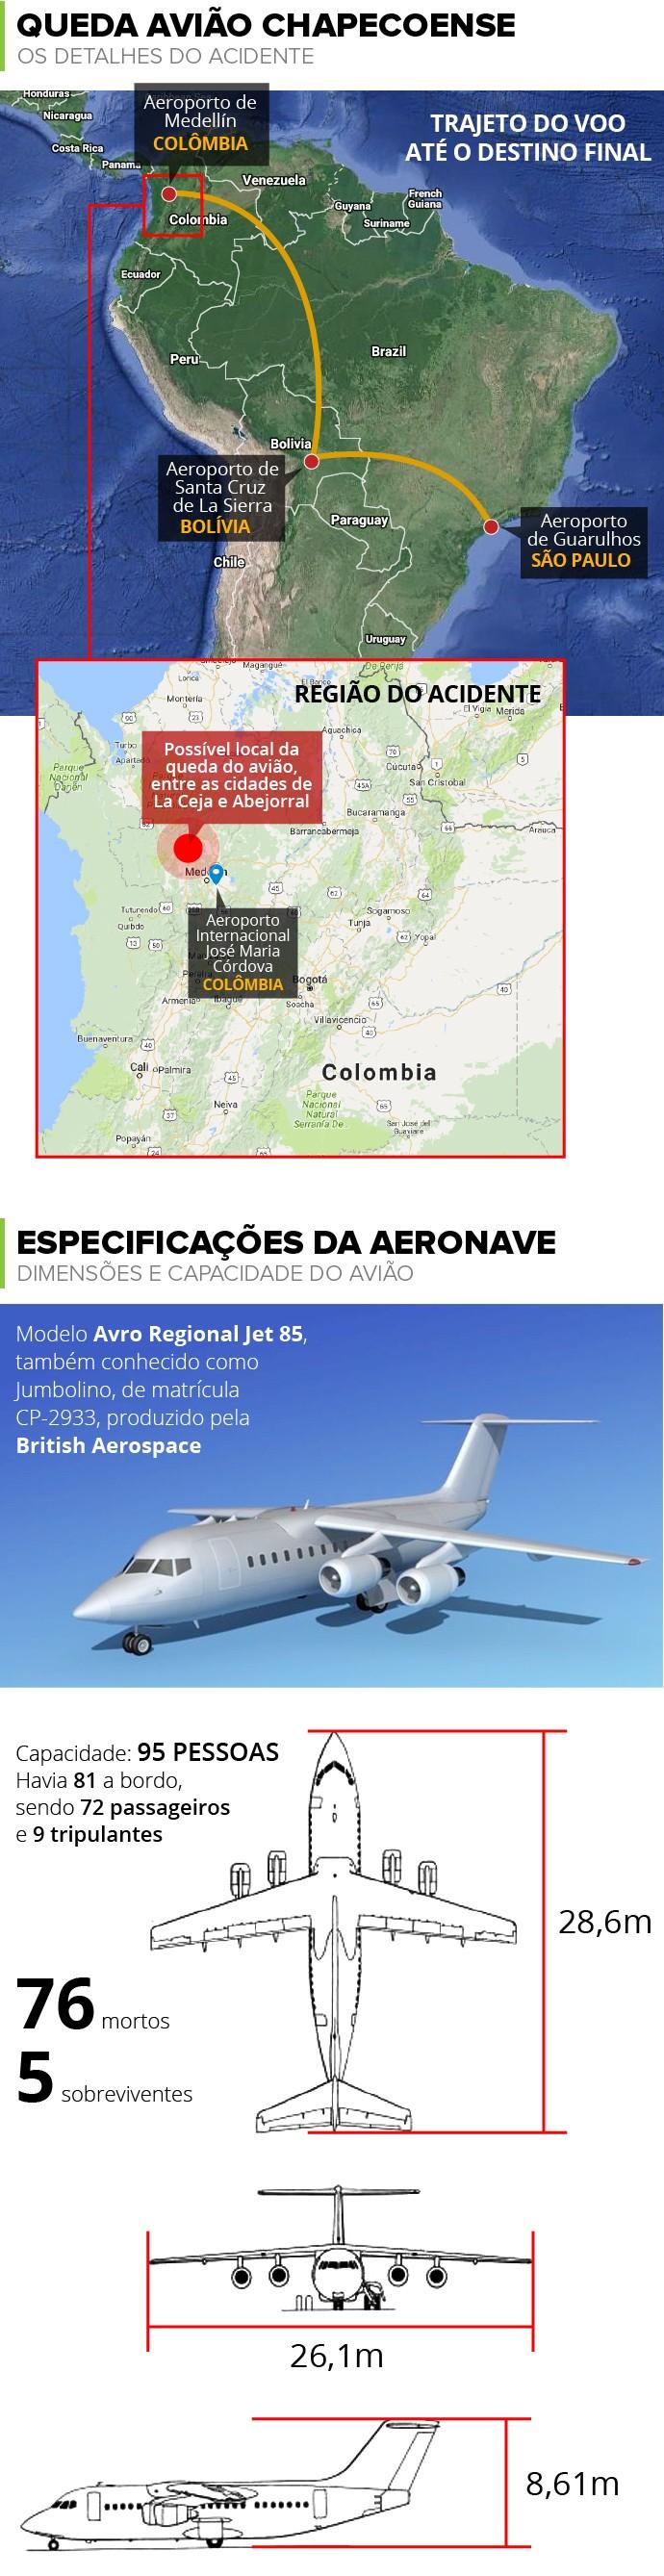 Info QUEDA AVIAO Chapecoense C (Foto: infoesporte)